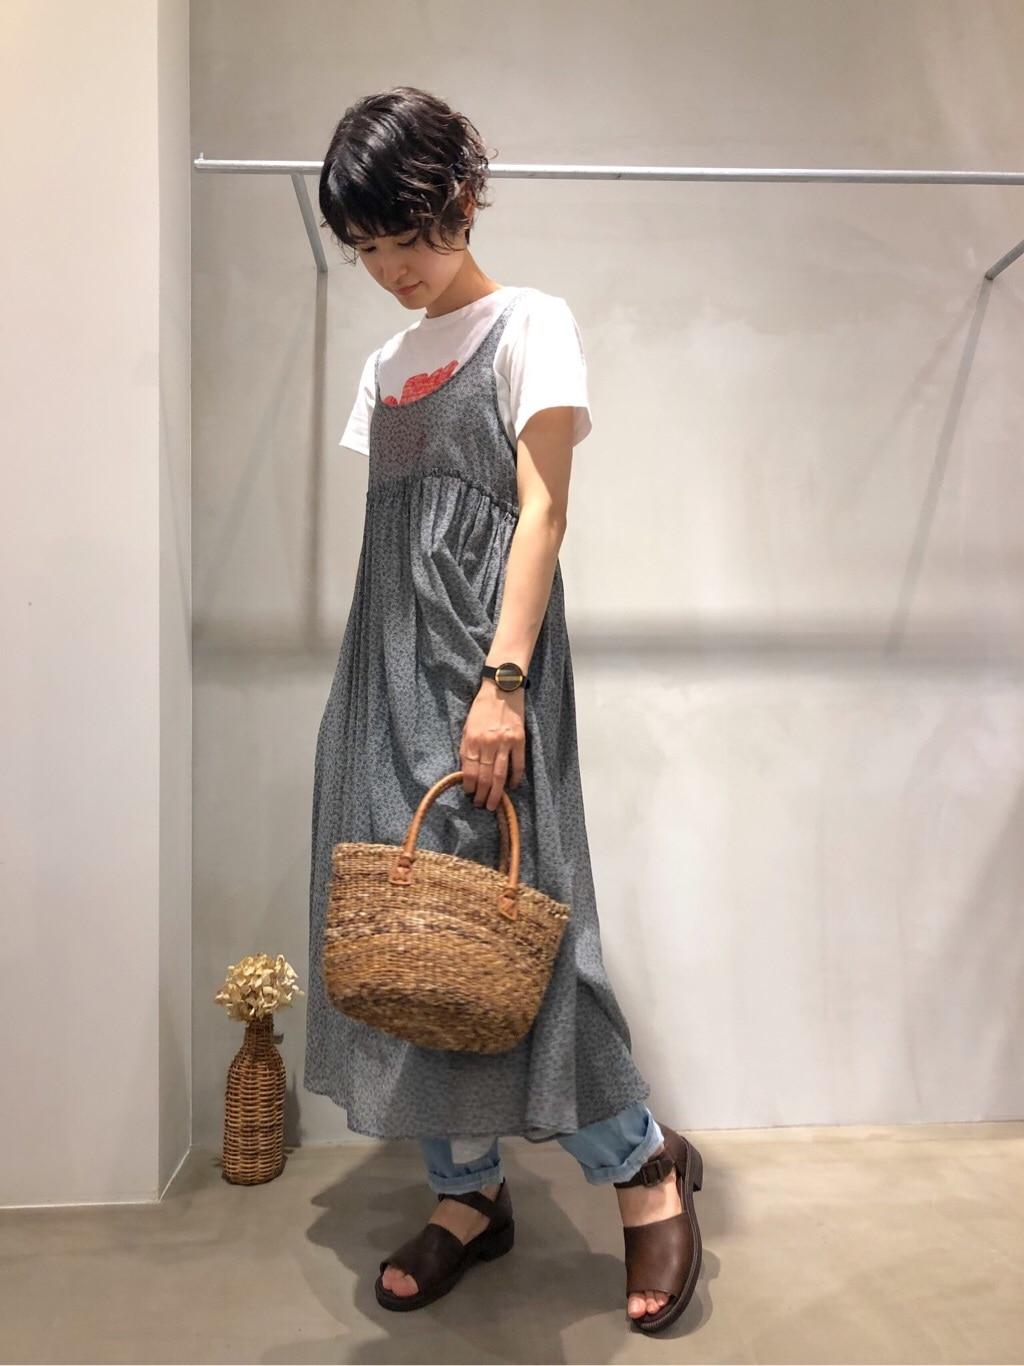 yuni / bulle de savon 京都路面 身長:159cm 2020.07.30